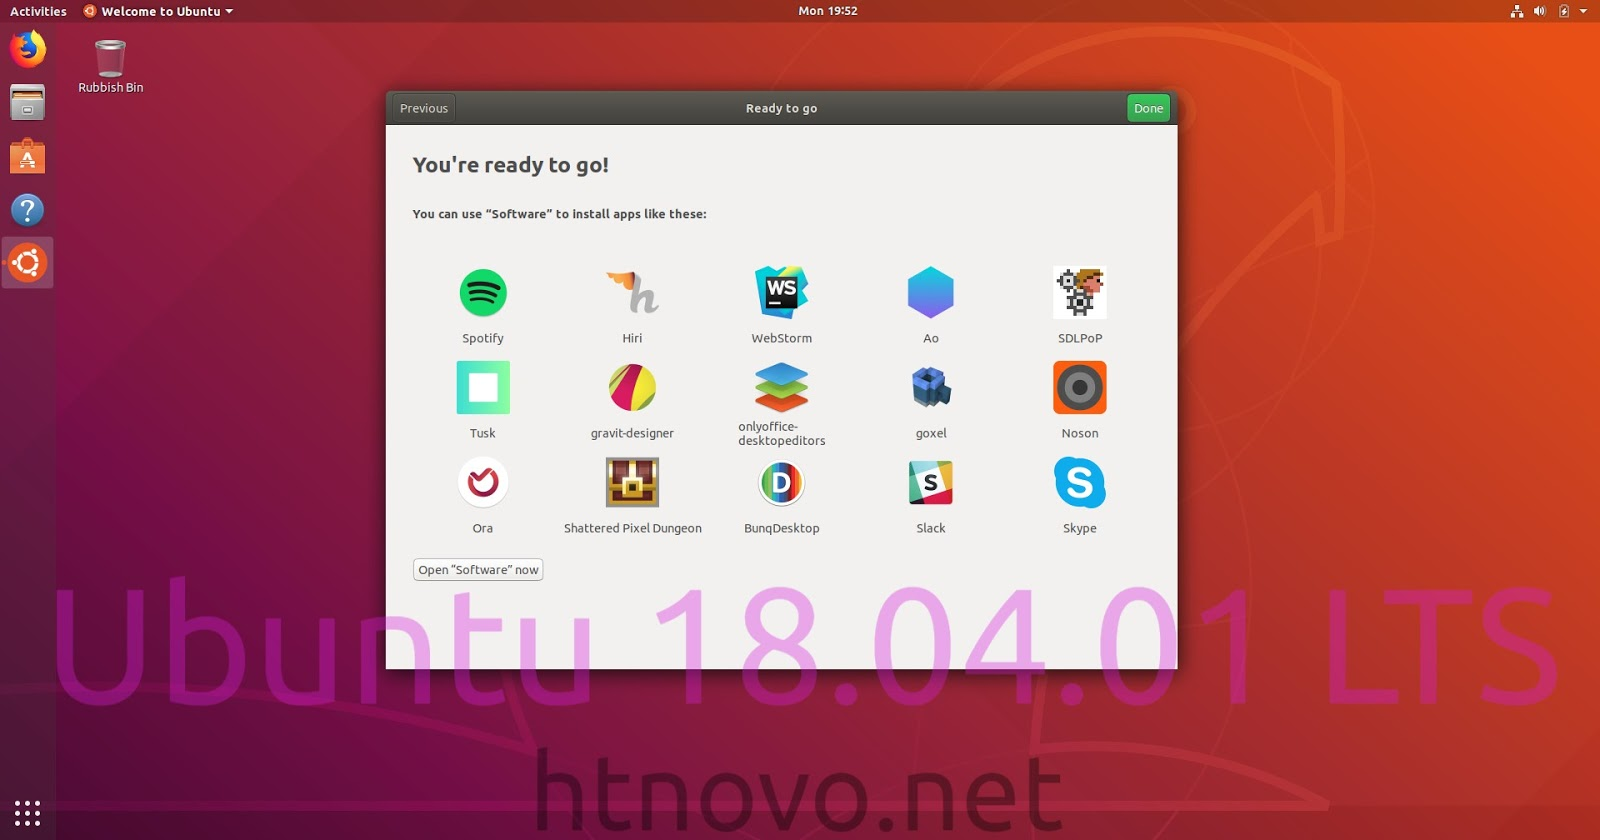 Ubuntu-18.04.01-LTS-point-release